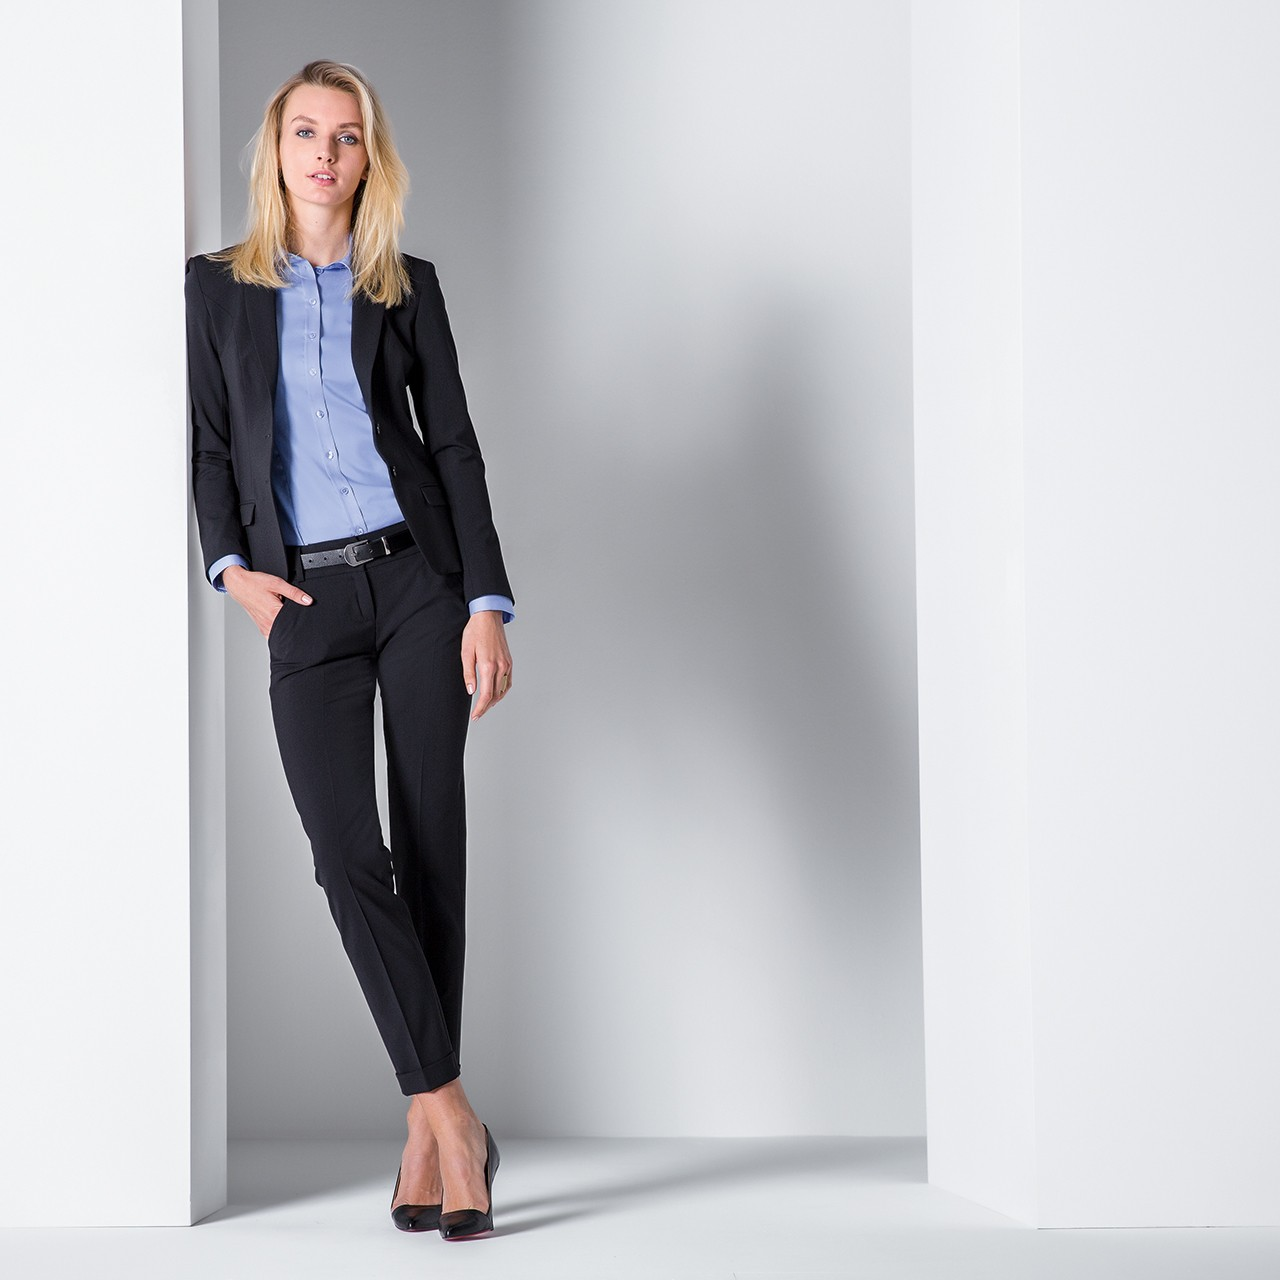 Damen Hose Slim Fit Greiff® | bedrucken, besticken, bedrucken lassen, besticken lassen, mit Logo |